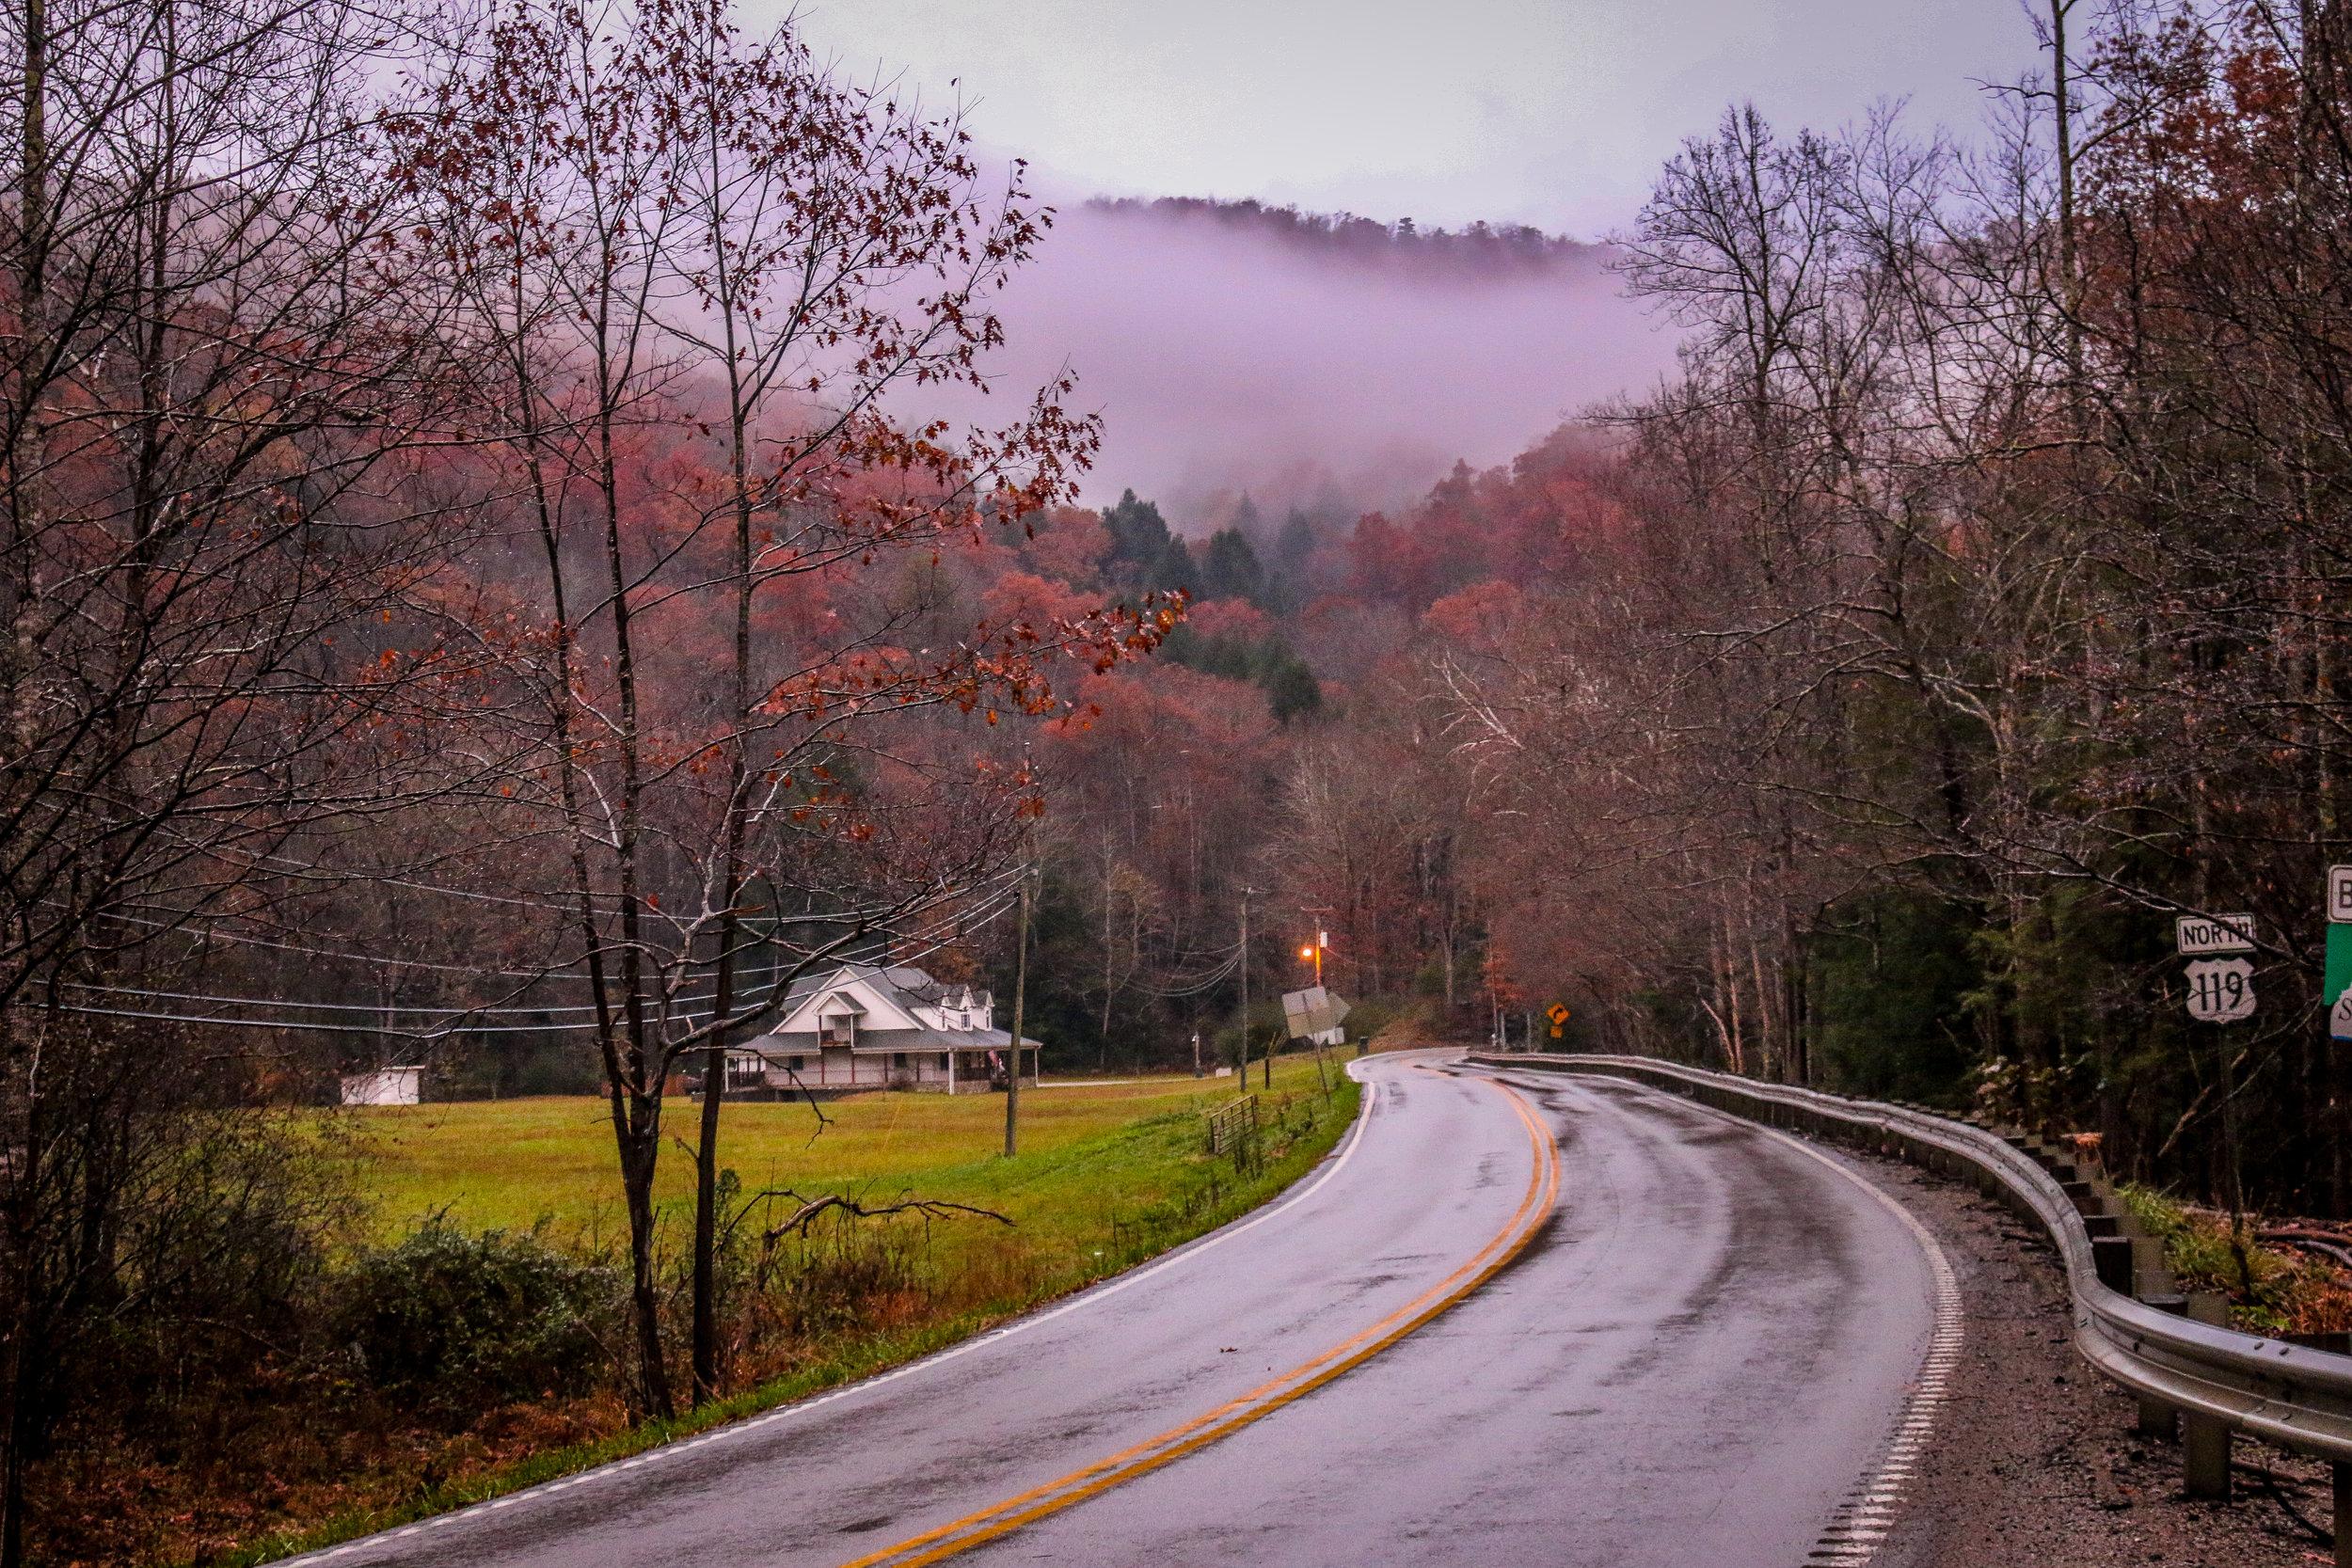 Appalachian Highway 119 in the Fog